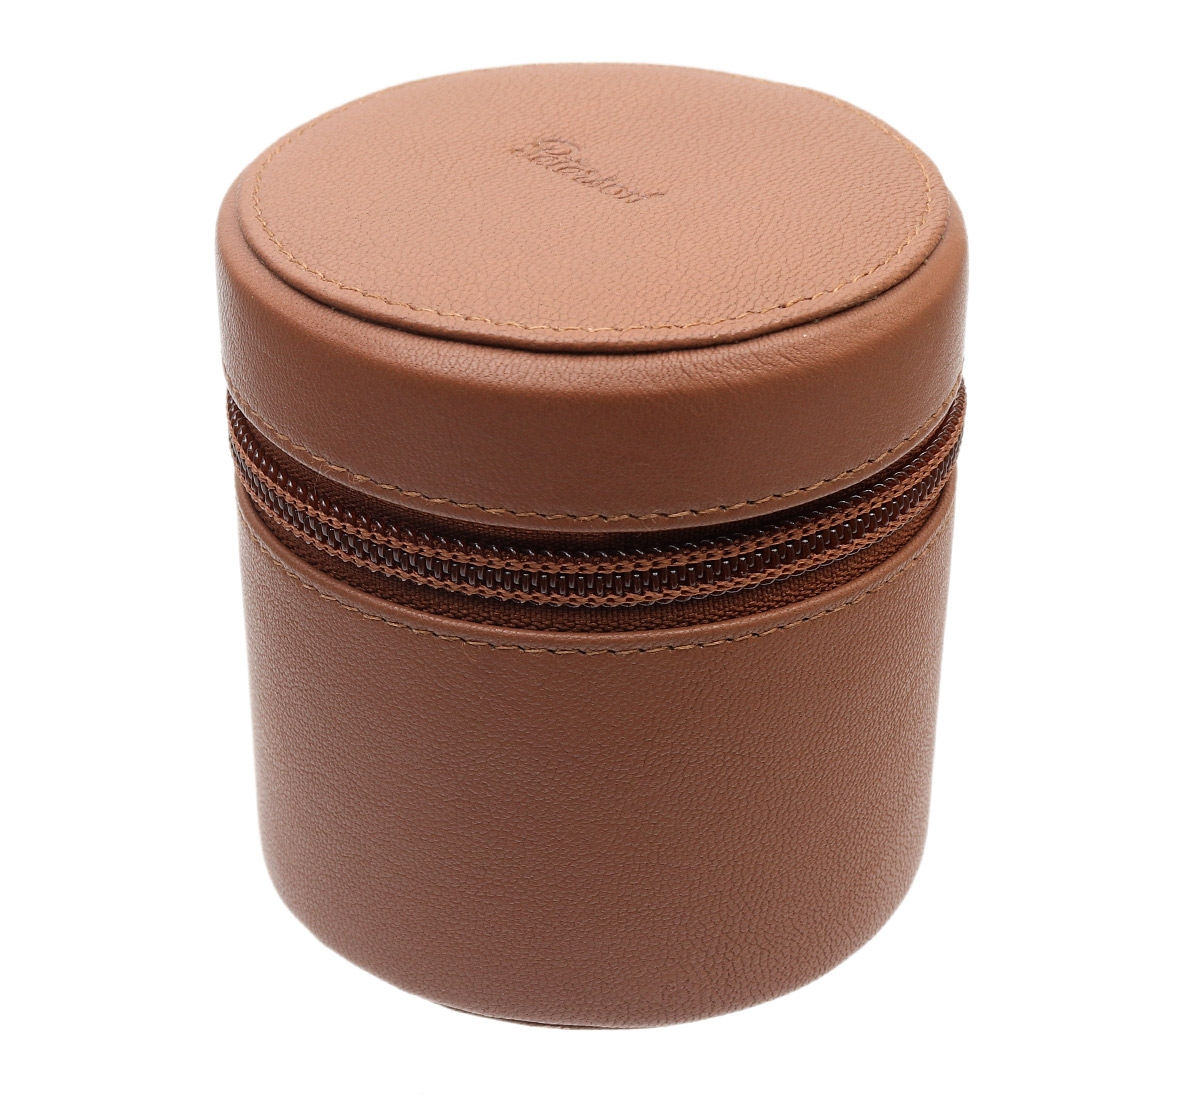 Peterson Grafton Medium Tobacco Jar